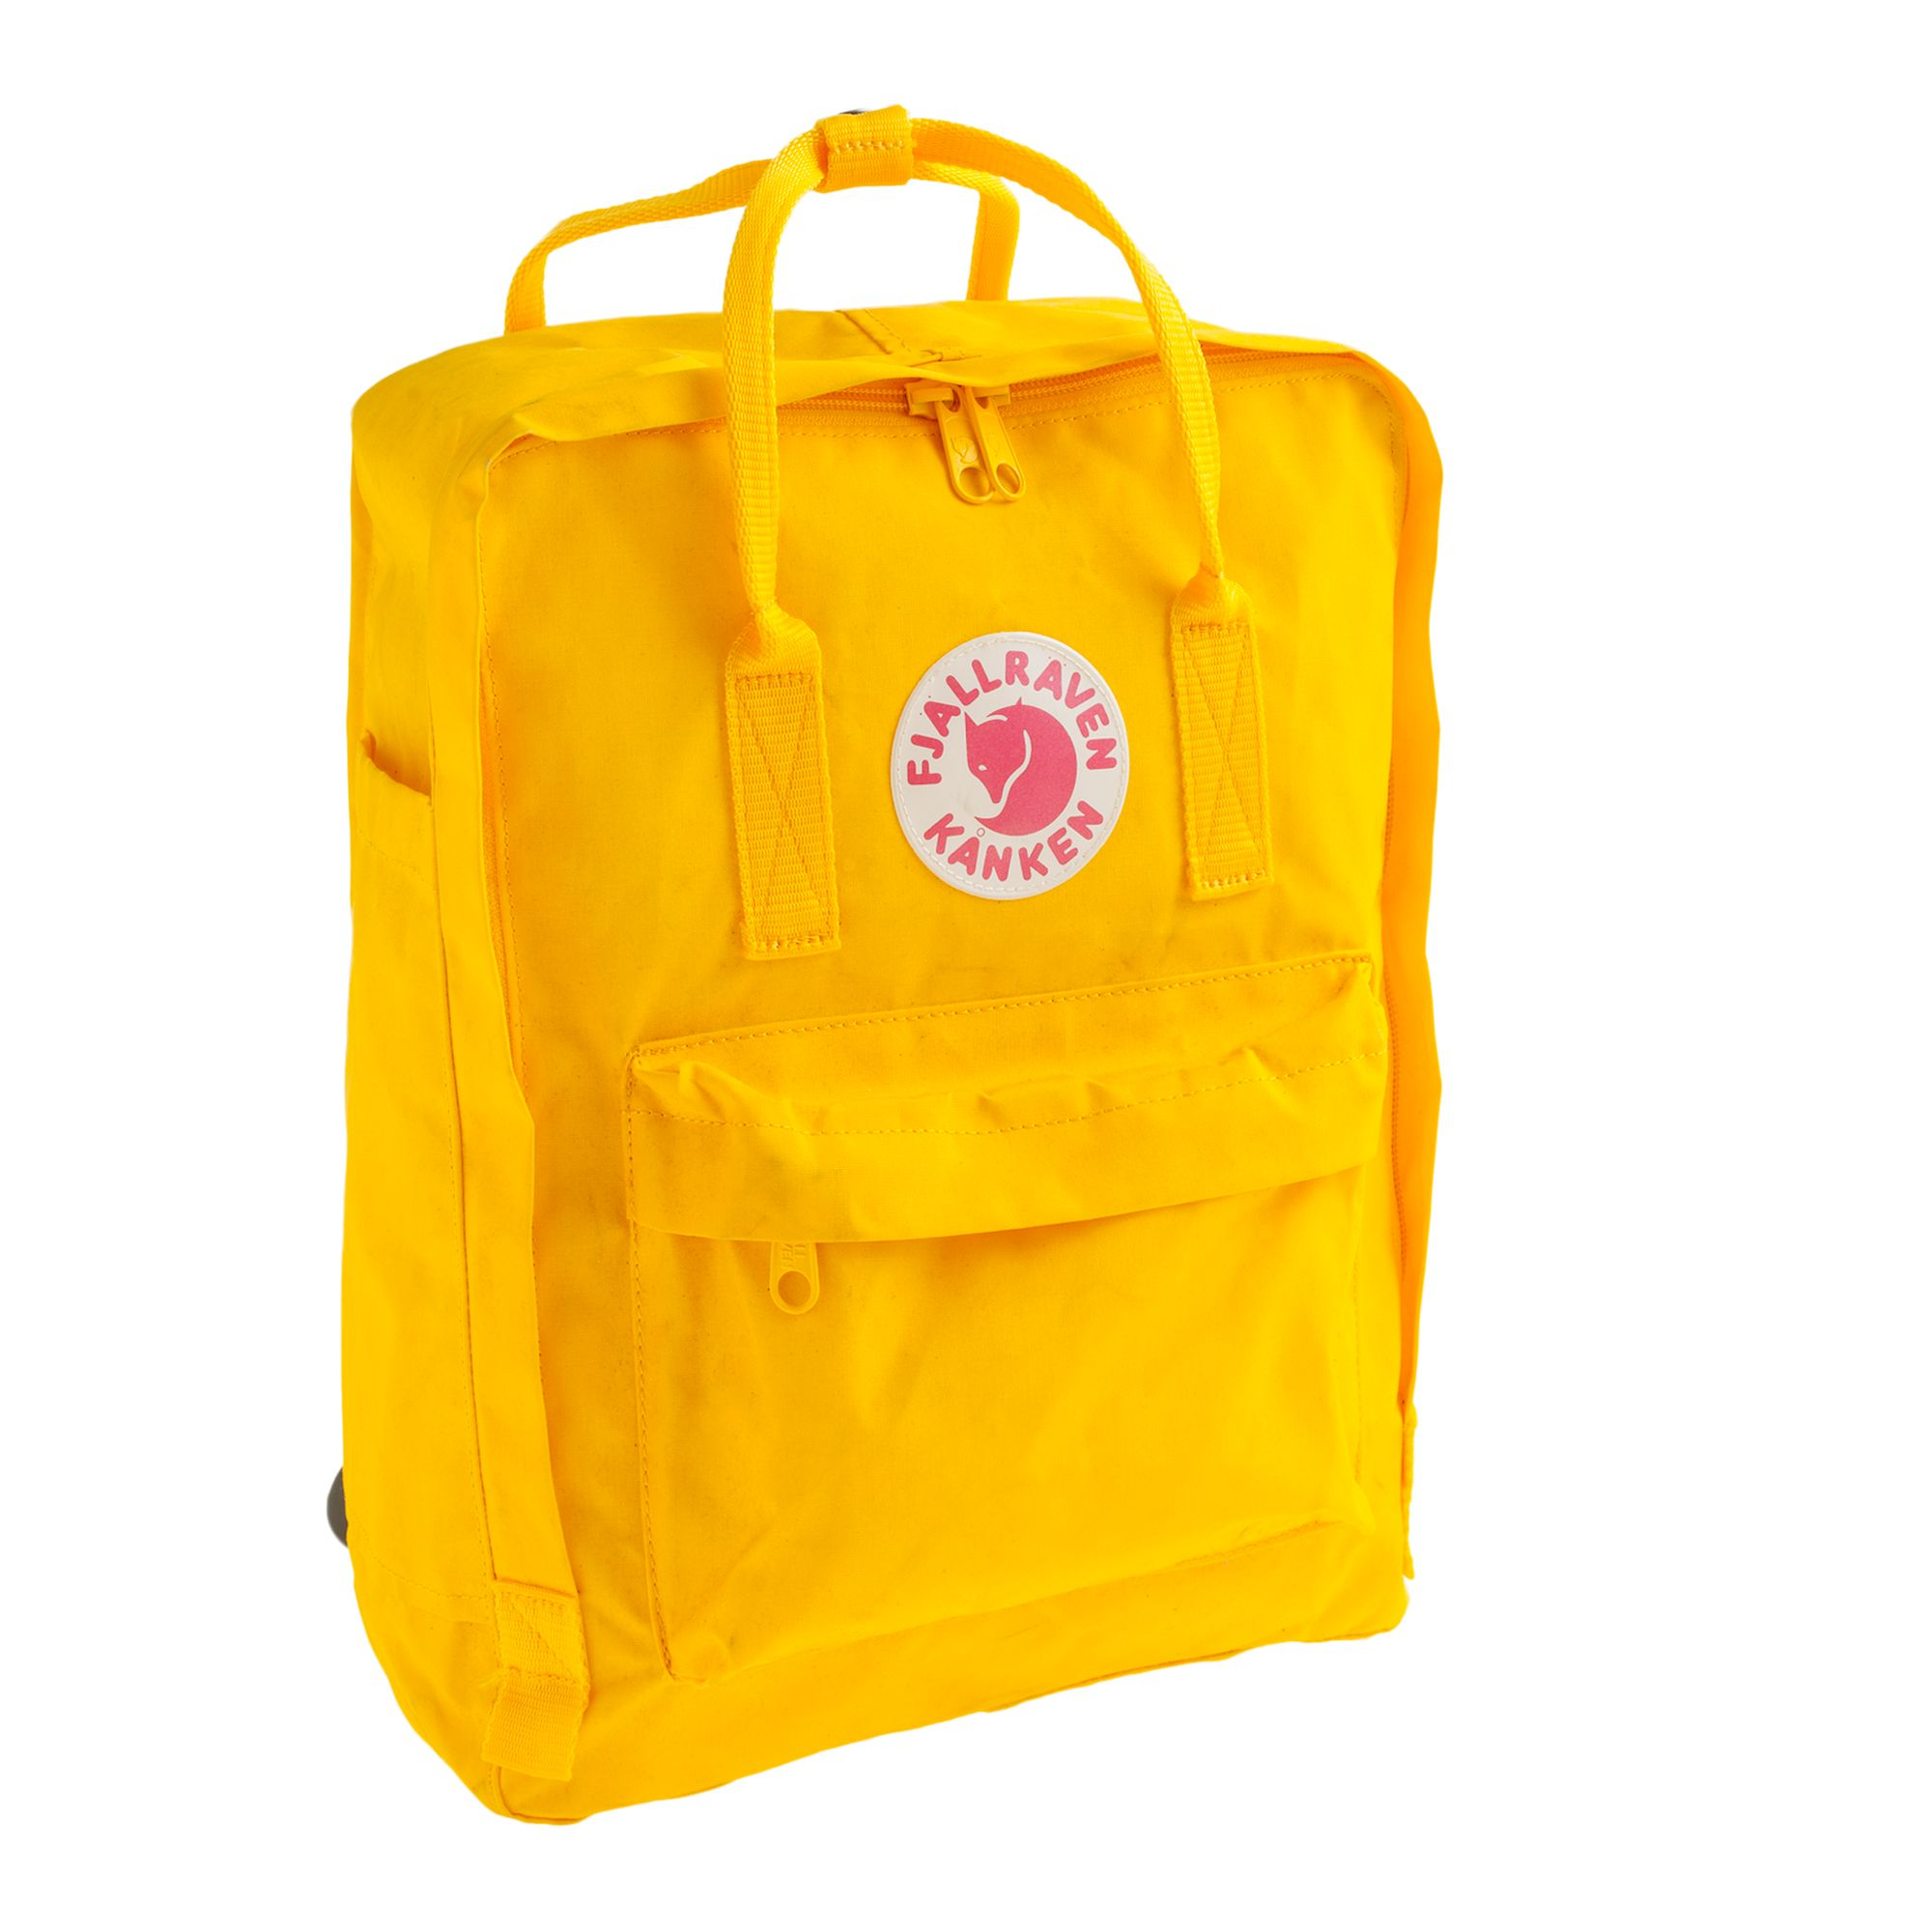 J Crew Fj 228 Llr 228 Ven 174 Classic Kanken Backpack In Yellow For